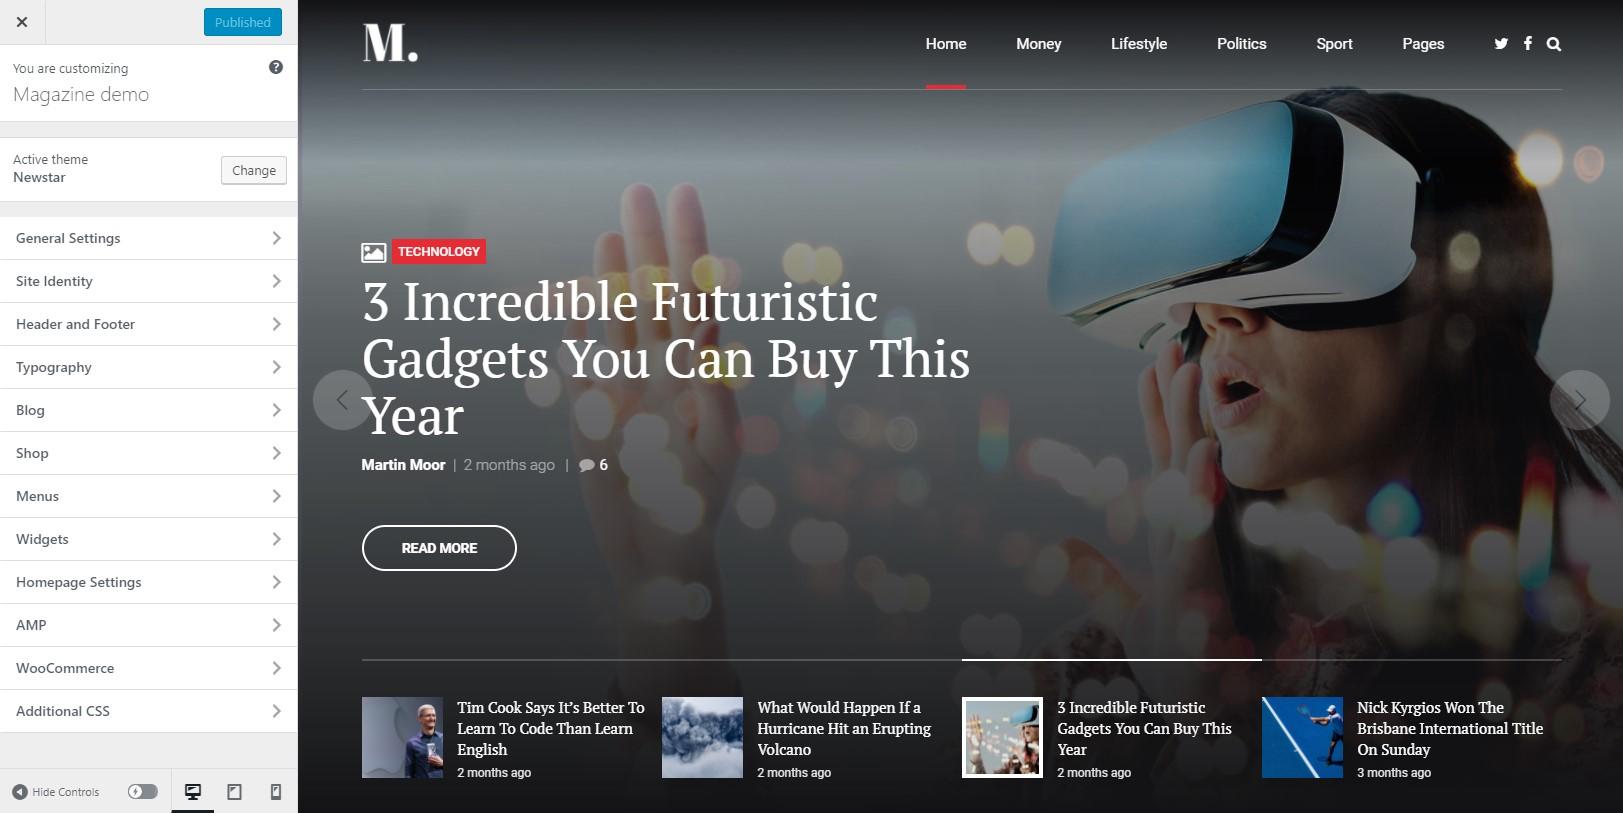 https://documentation.bold-themes.com/newstar/wp-content/uploads/sites/32/2018/03/customization.jpg